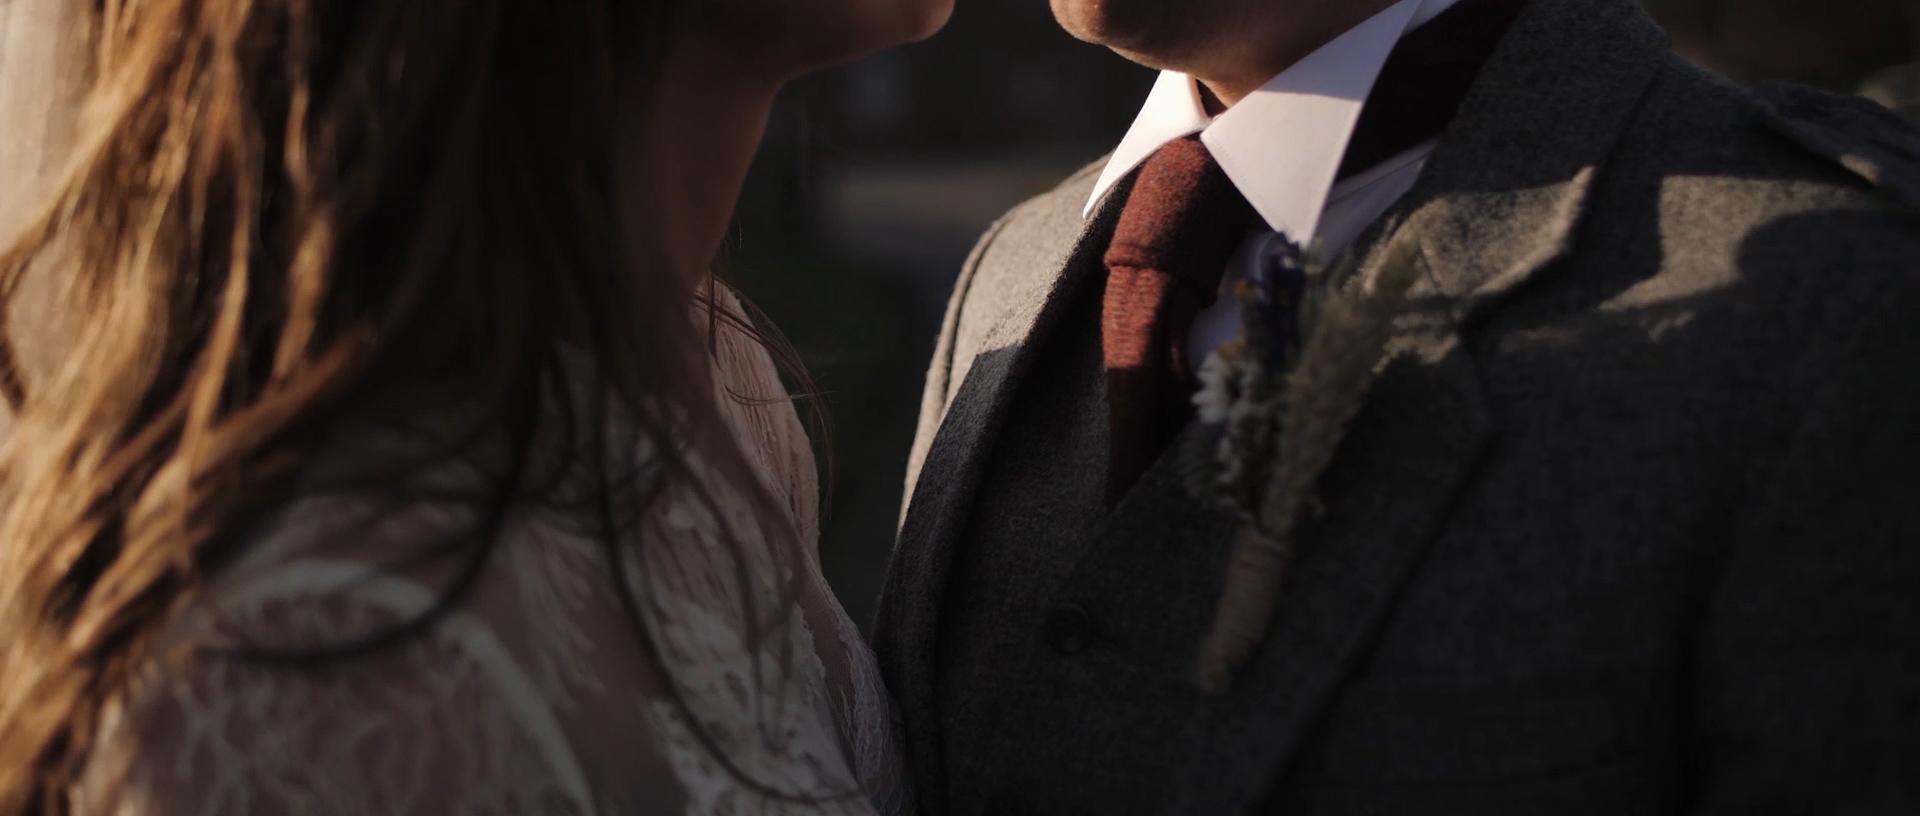 edinburgh-wedding-videographer_LL_04.jpg